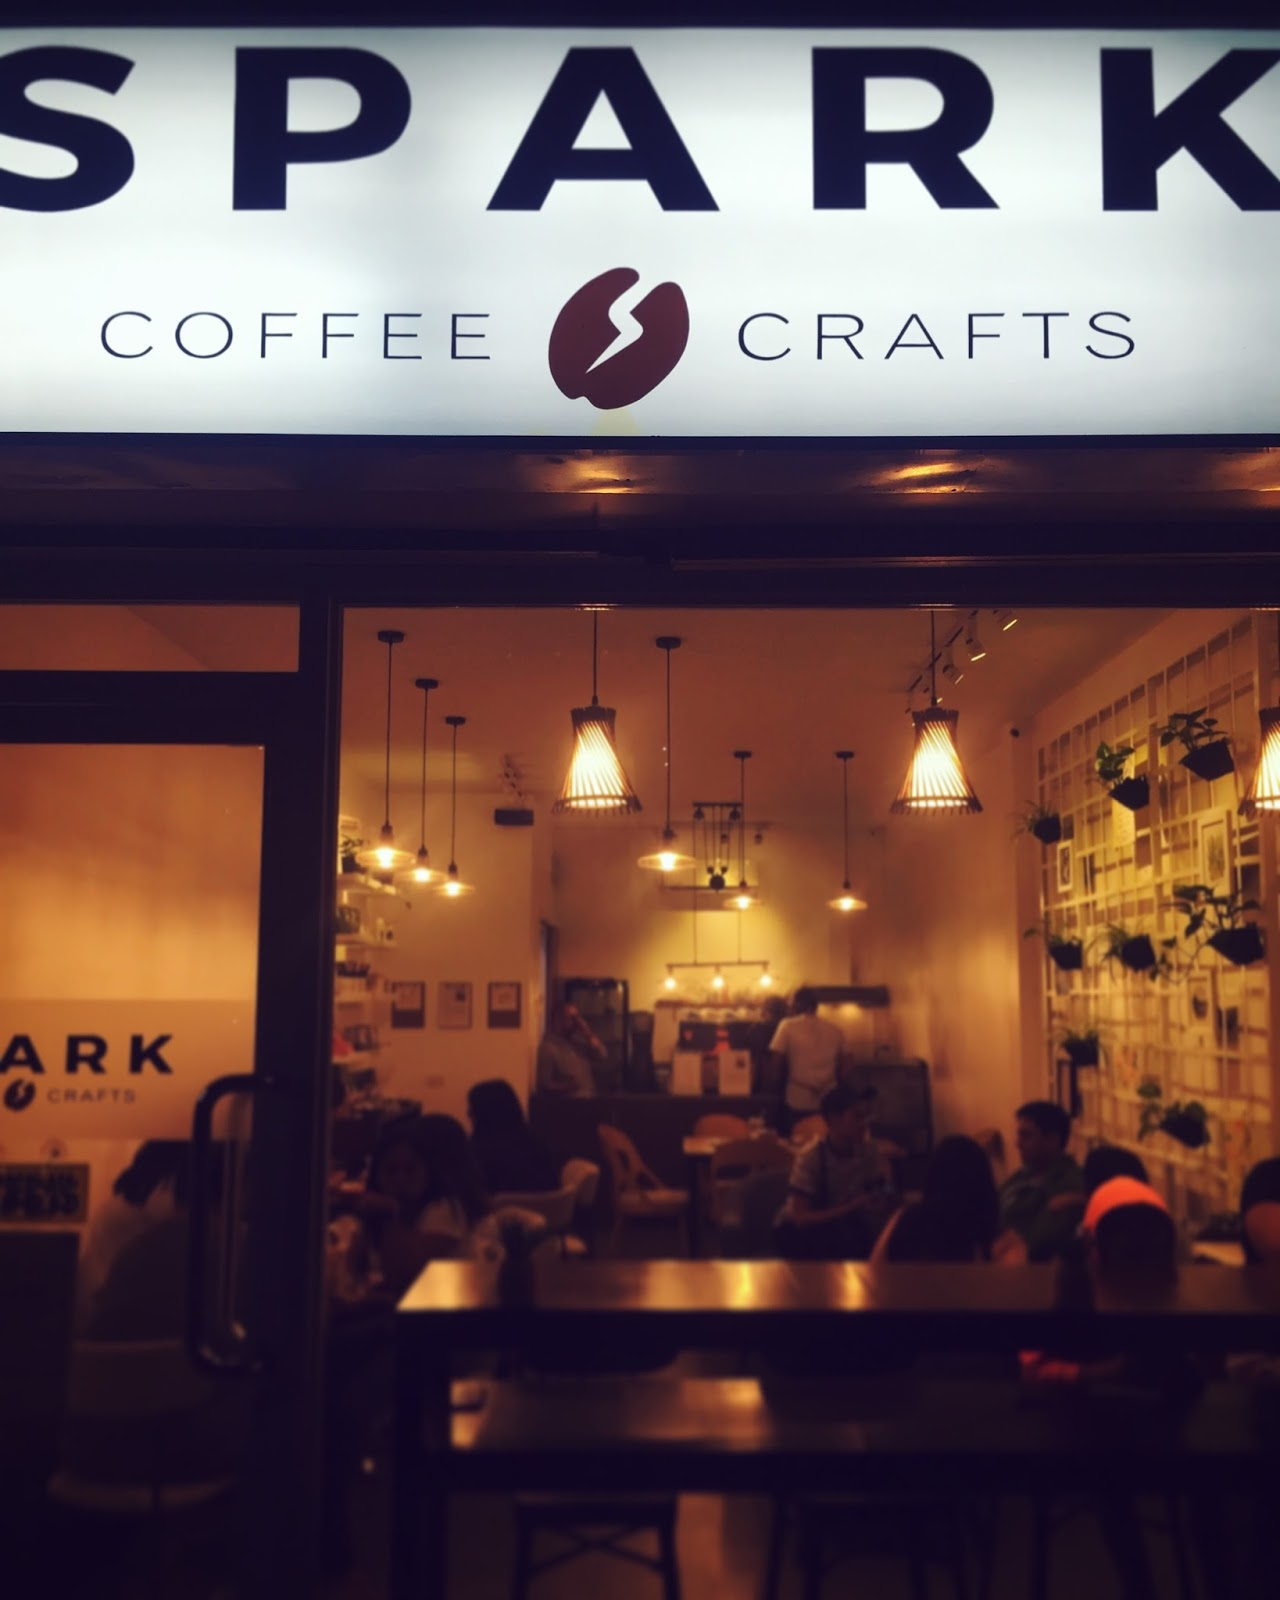 Friend Corner Cafe